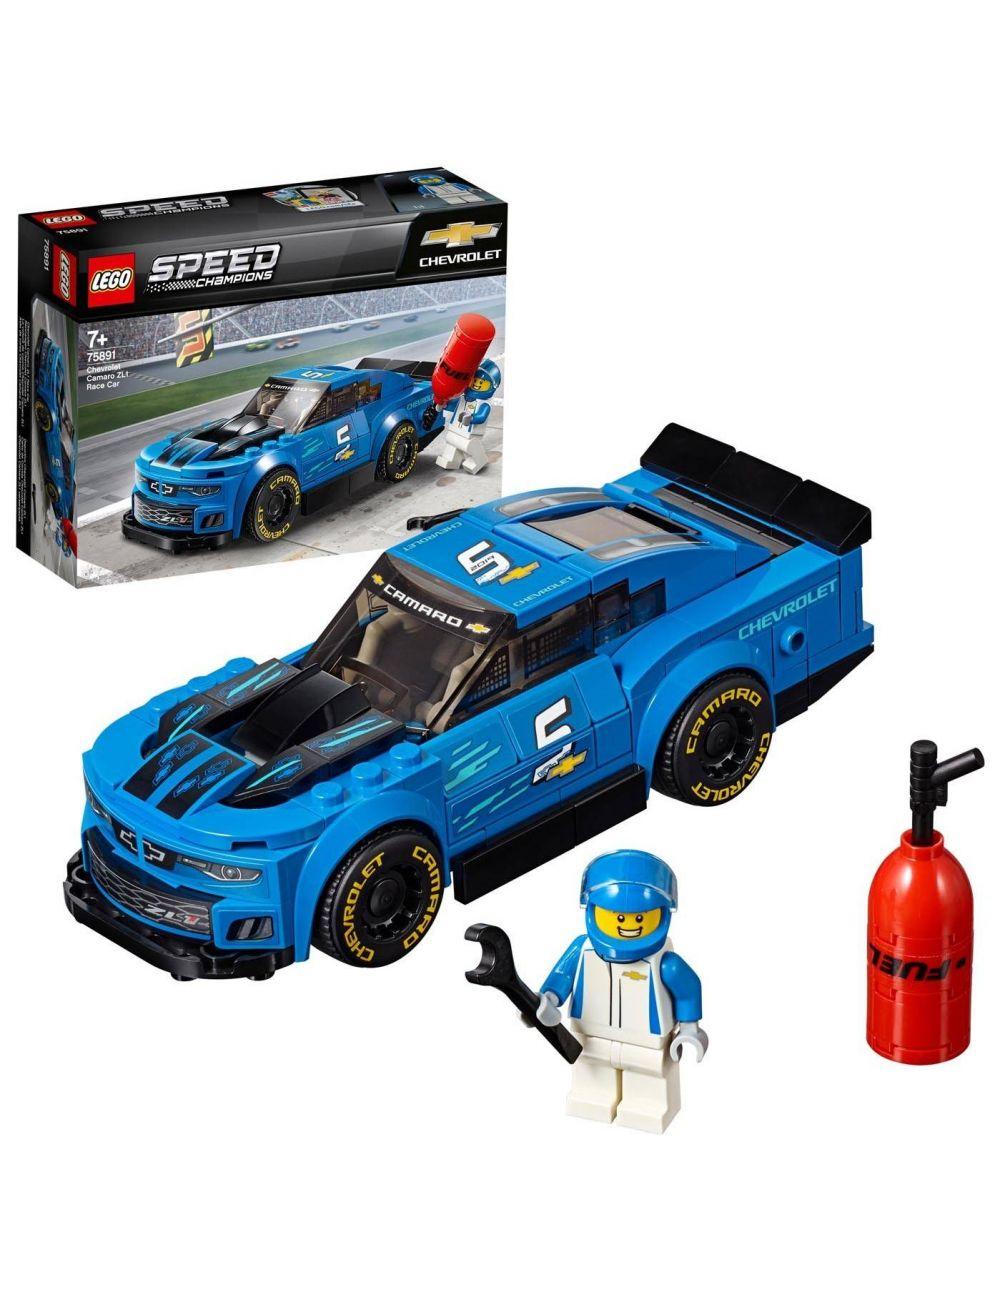 Lego Speed Champions Chevrolet Camaro ZL1 75891